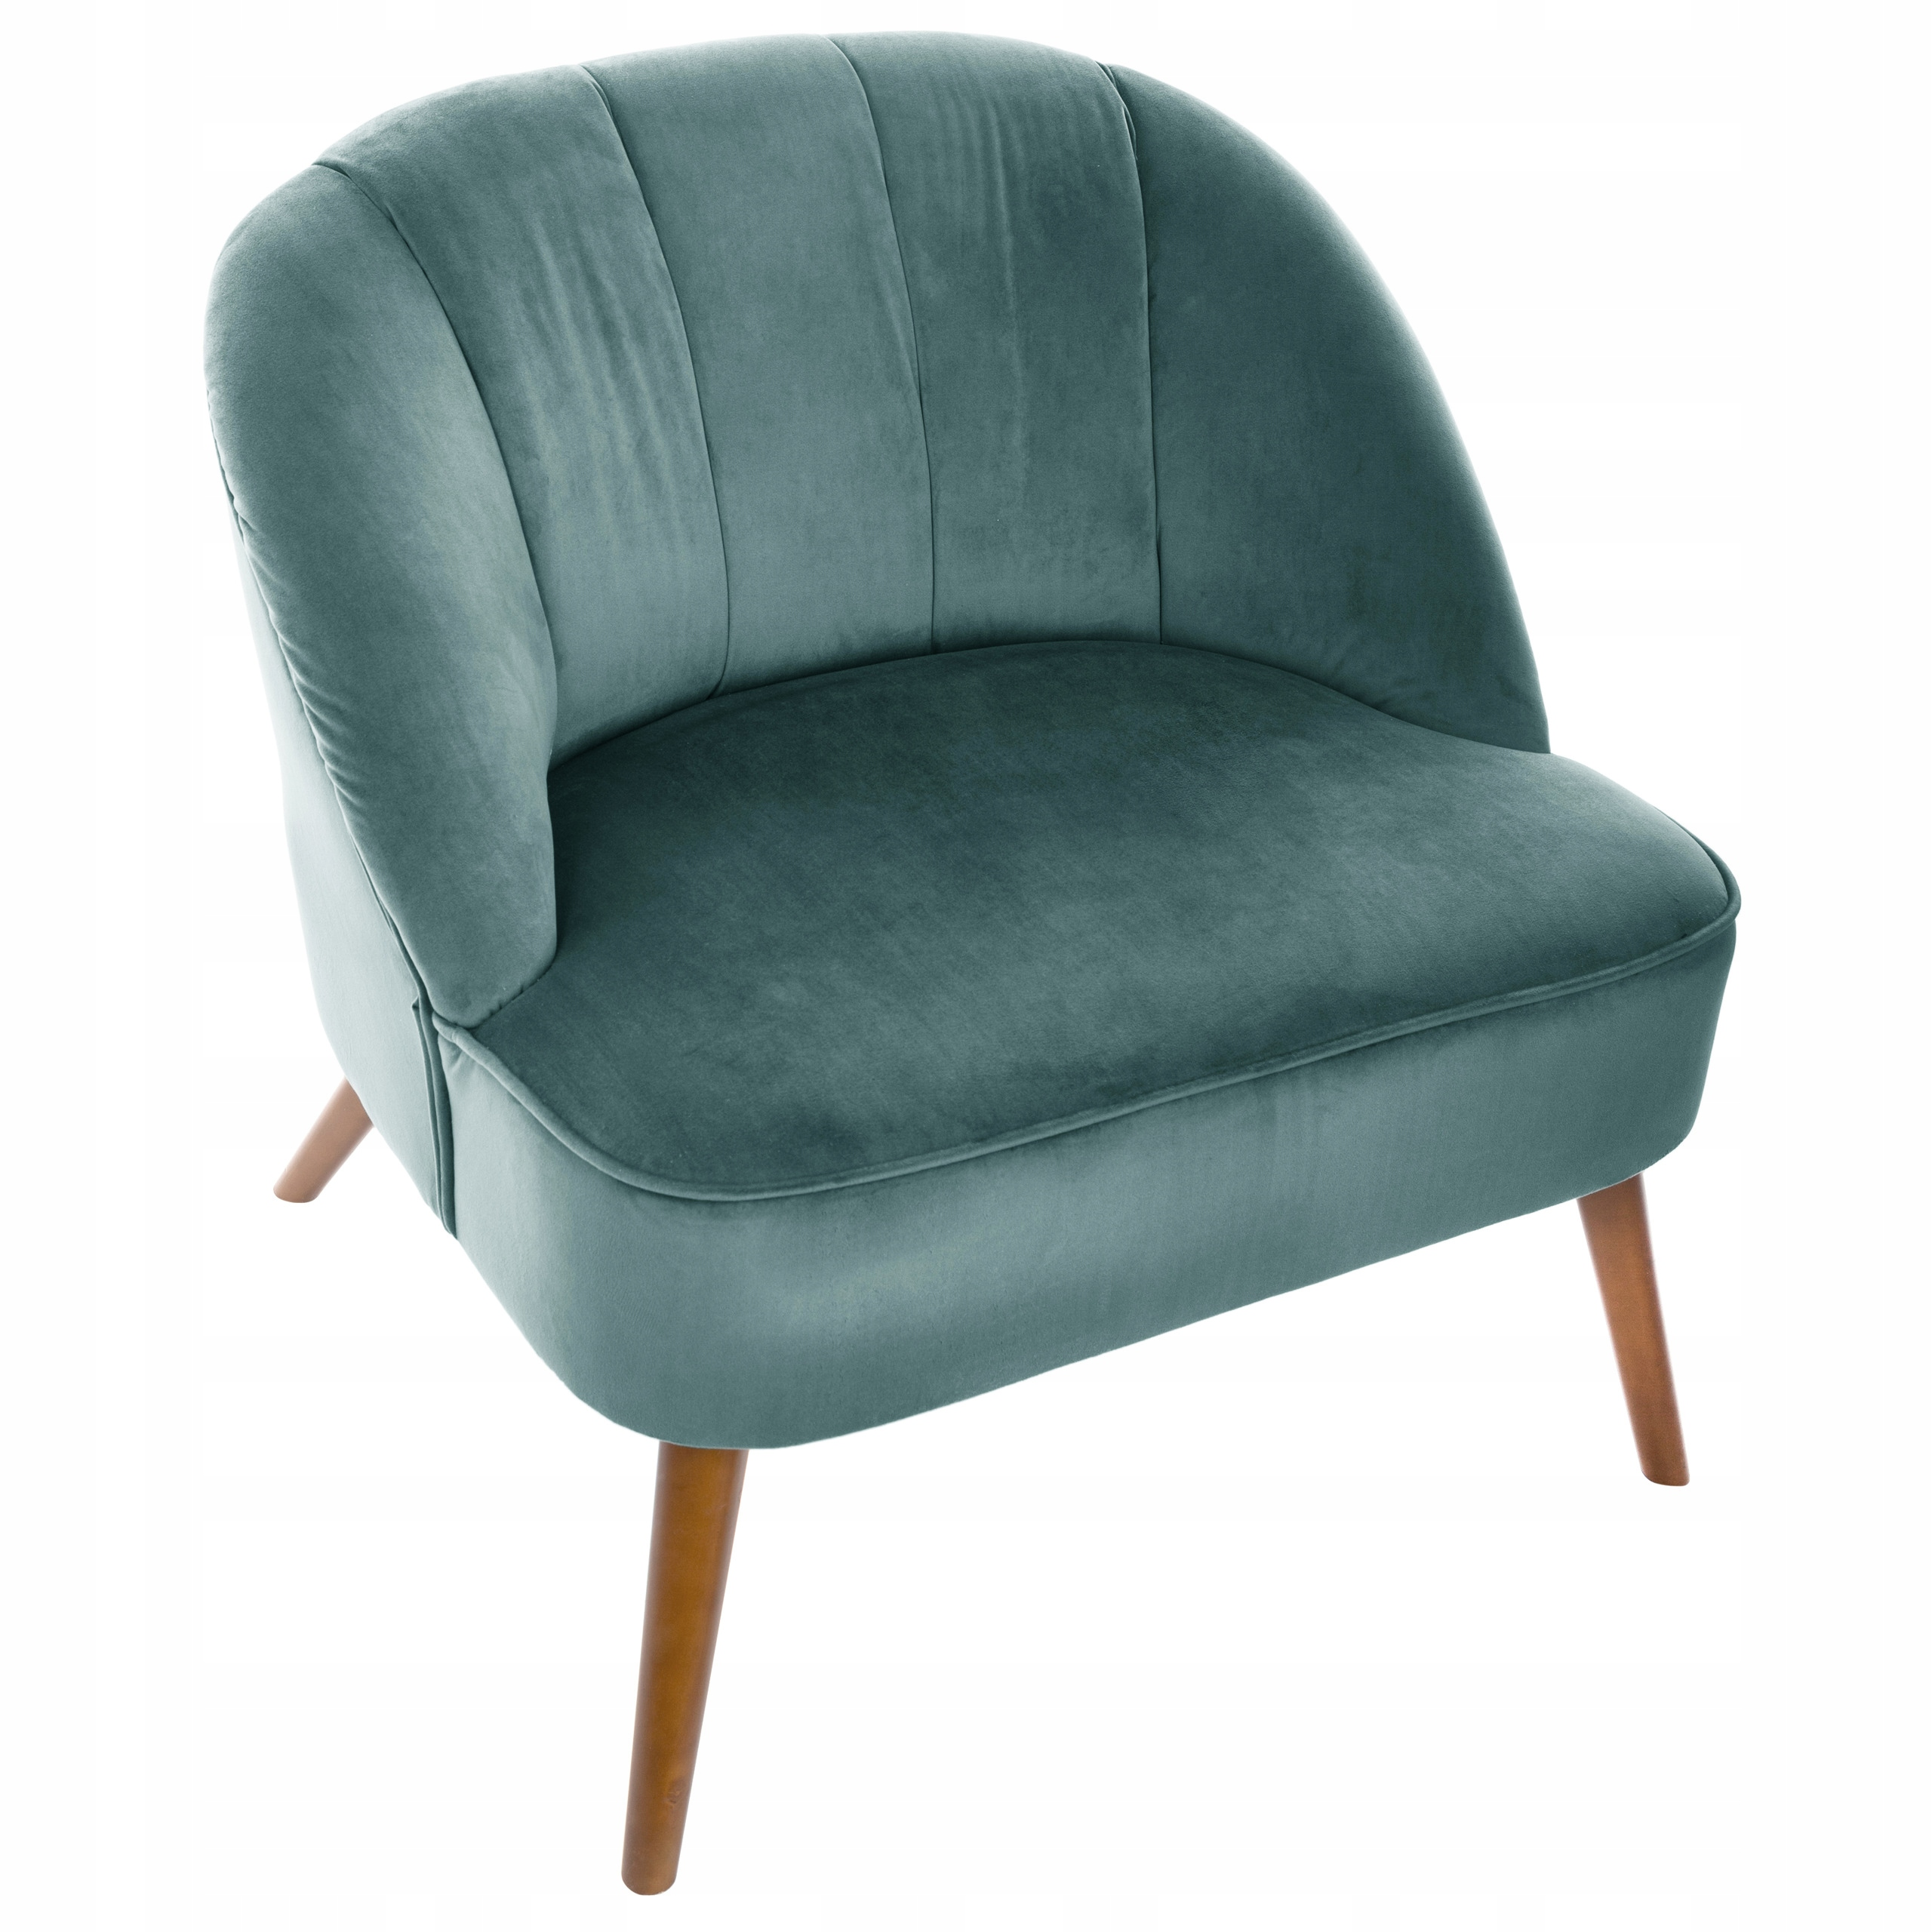 Modny Ekskluzywny Fotel Do Salonu Zielony Fotel 7910079435